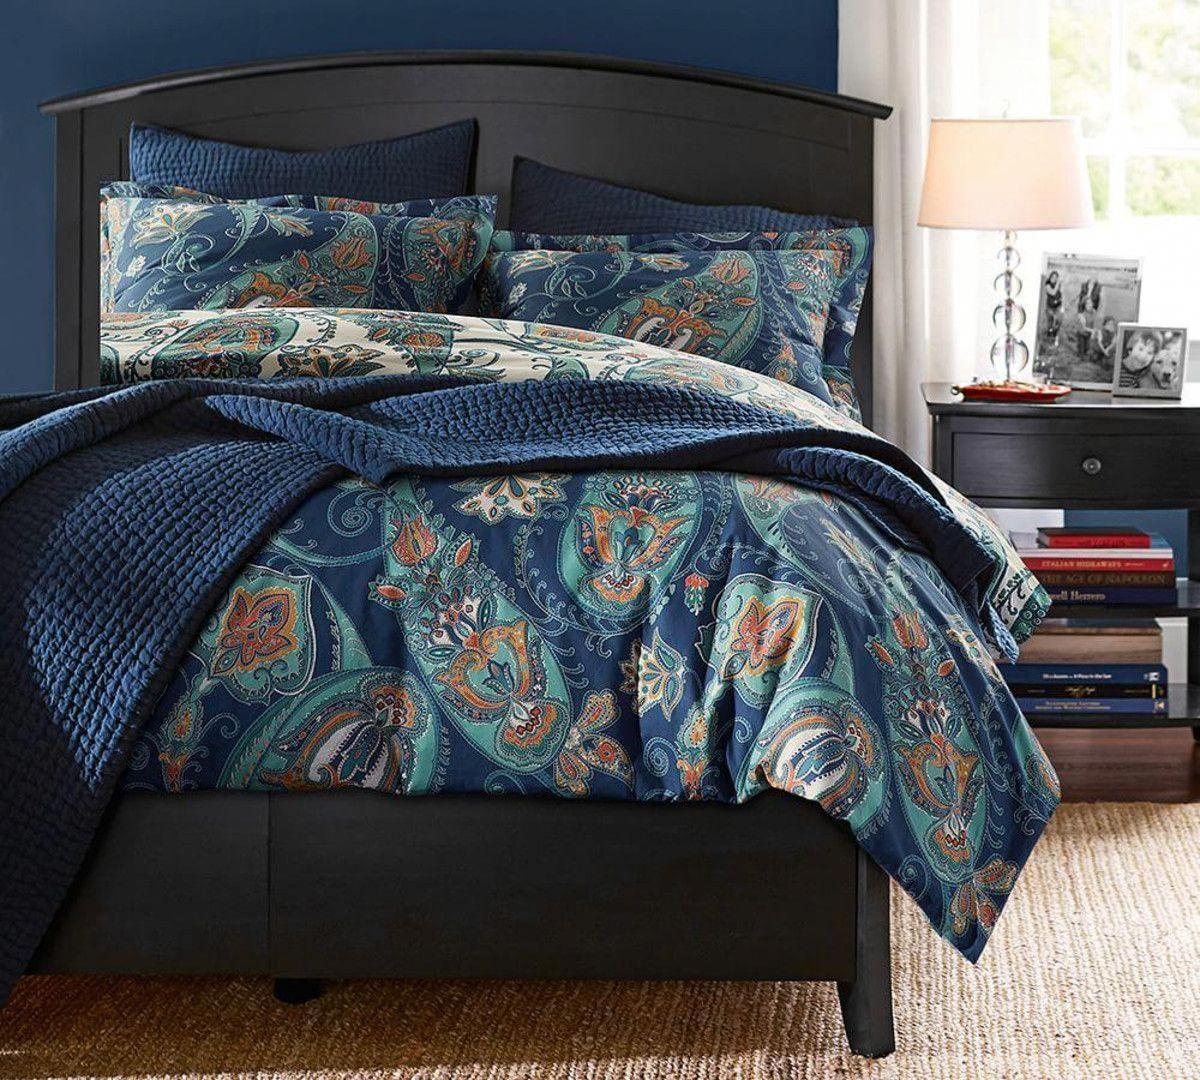 Photo of #FascinatingBeddingSets #BedComfortersForSale